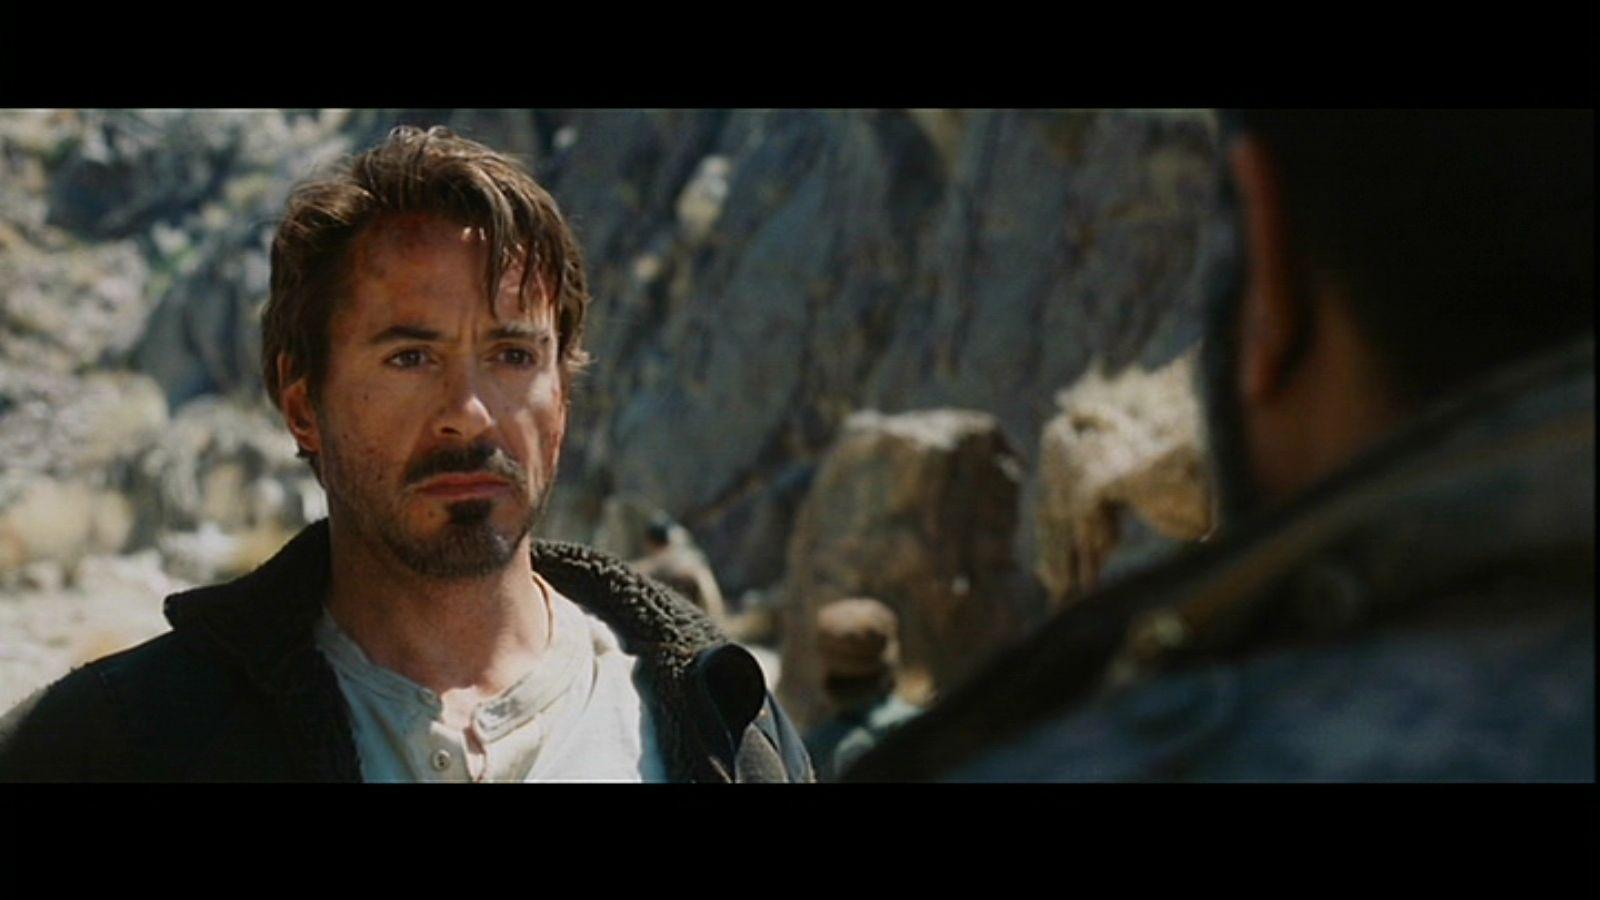 Iron Man Iron Man 0446 Screencaps Iron Man Tony Stark